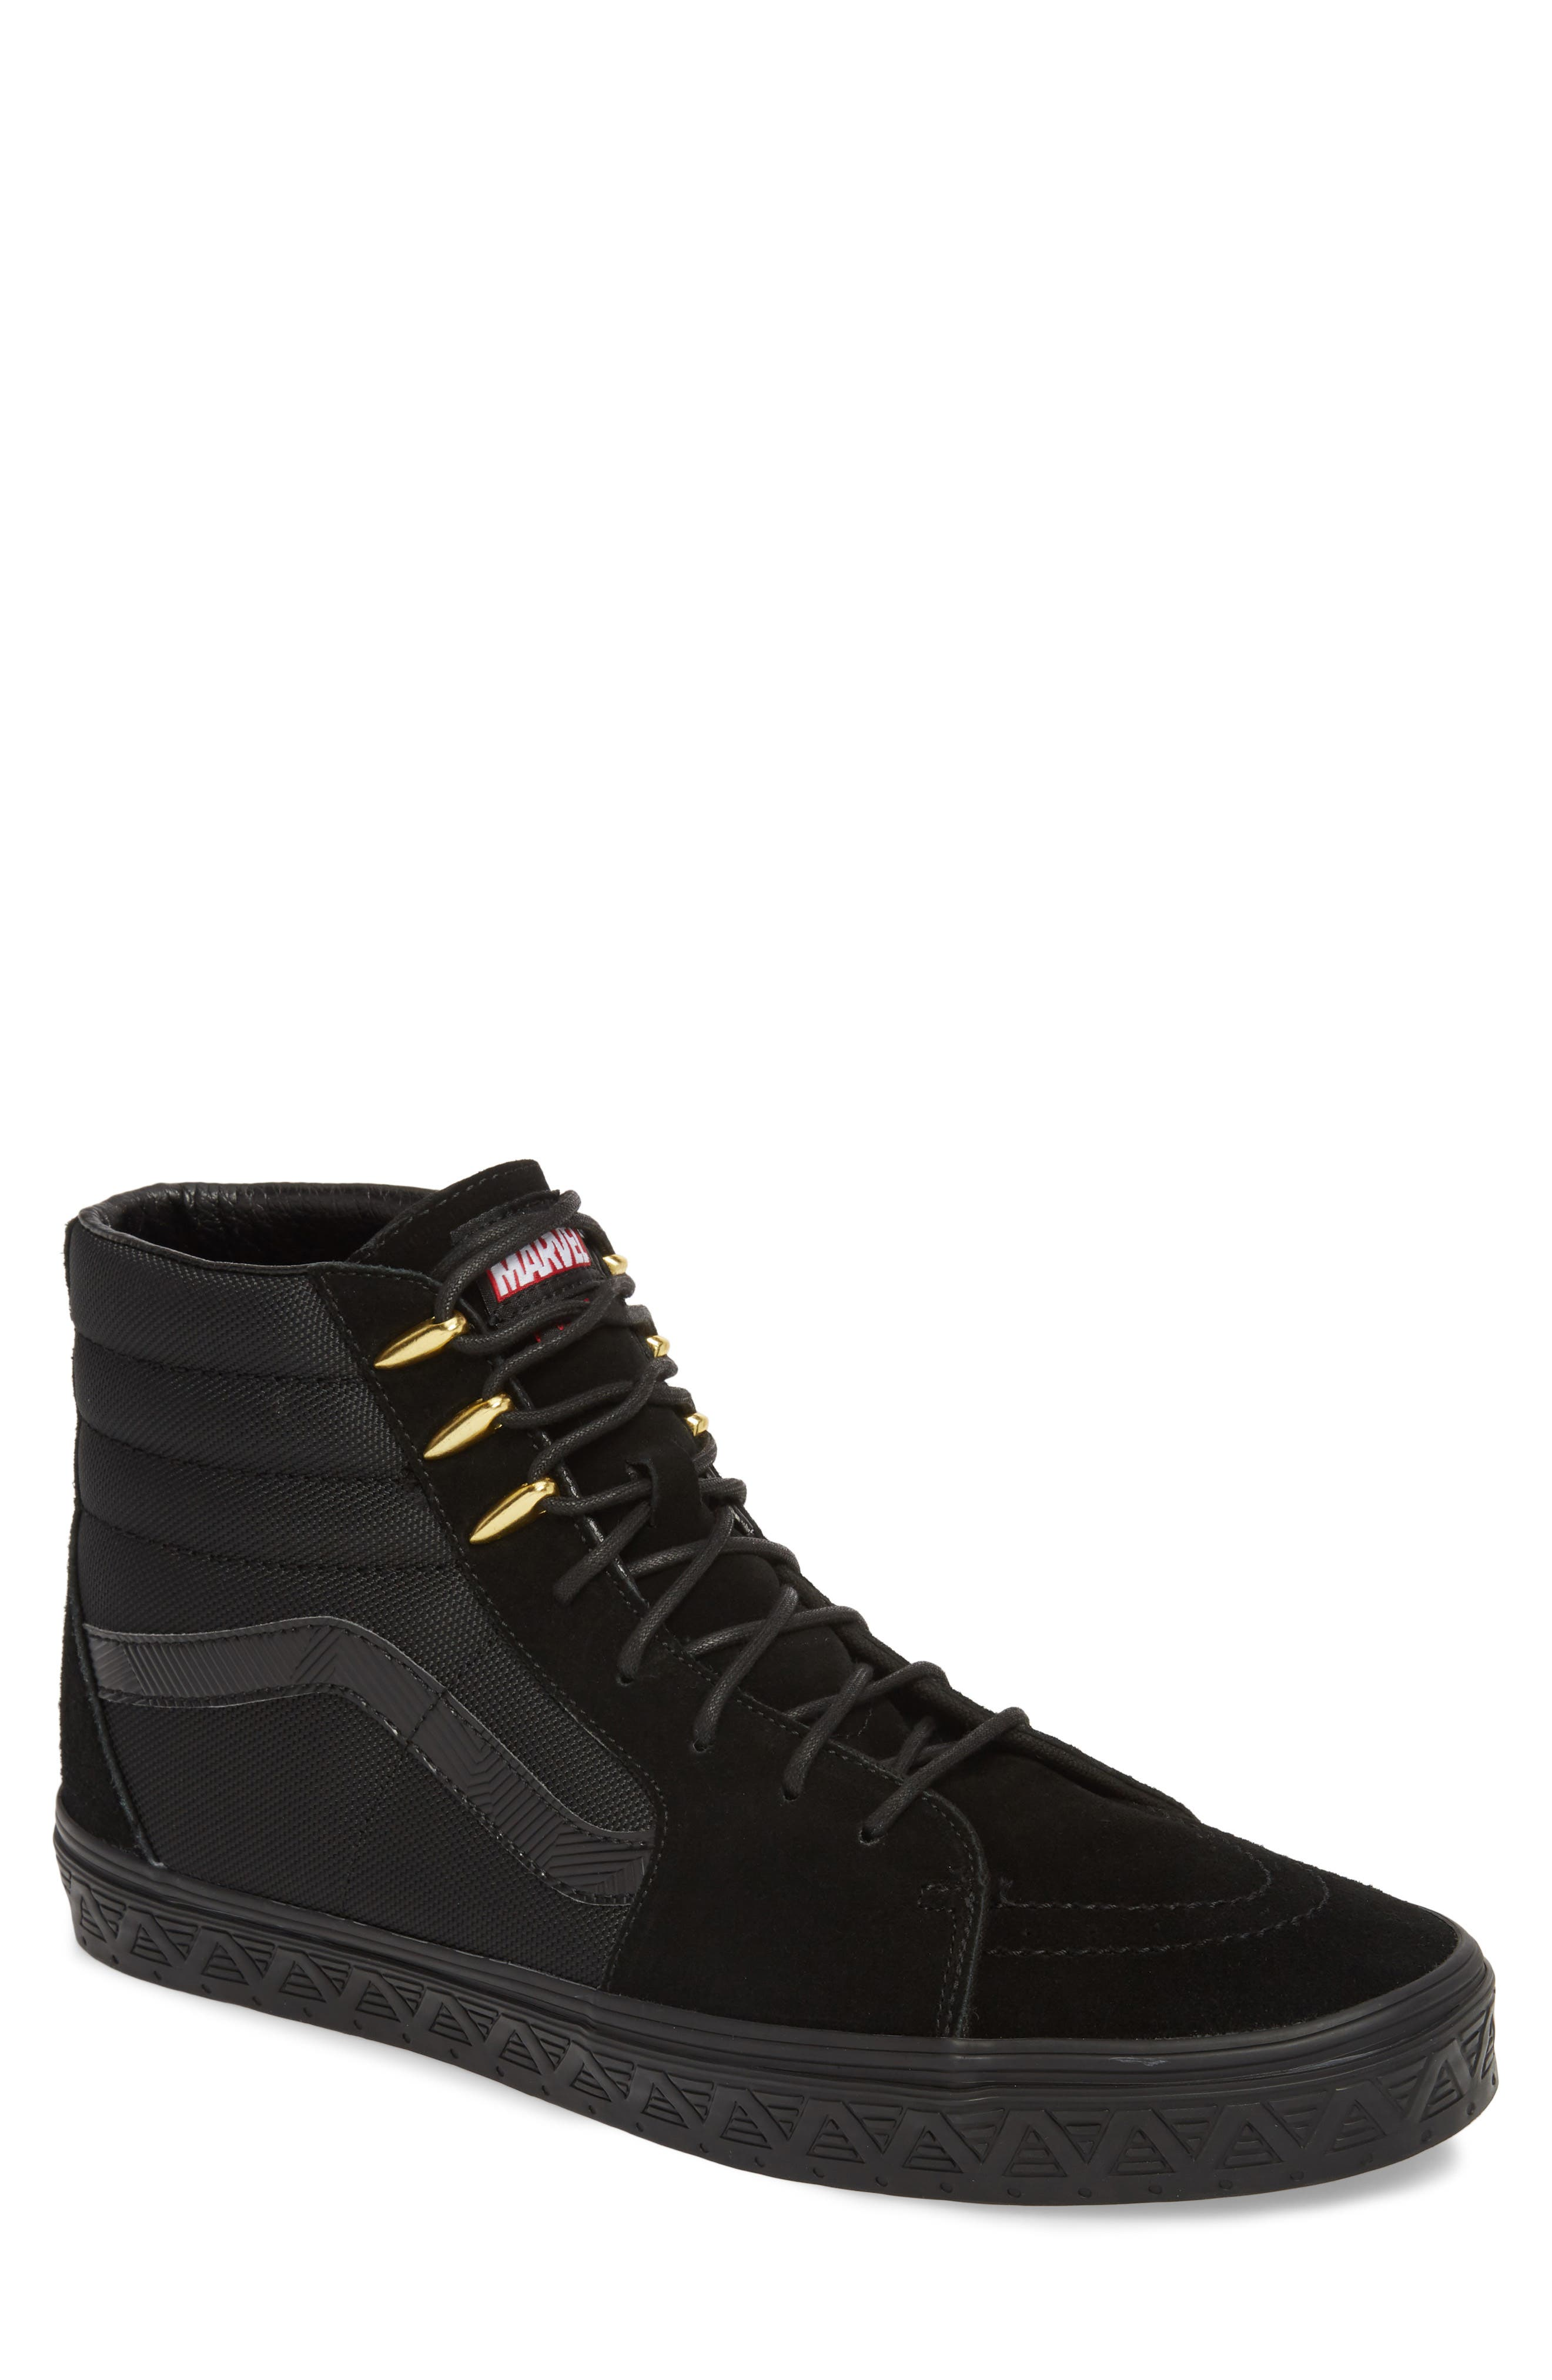 x Marvel<sup>®</sup> UA Sk8-Hi Sneaker,                         Main,                         color, 001